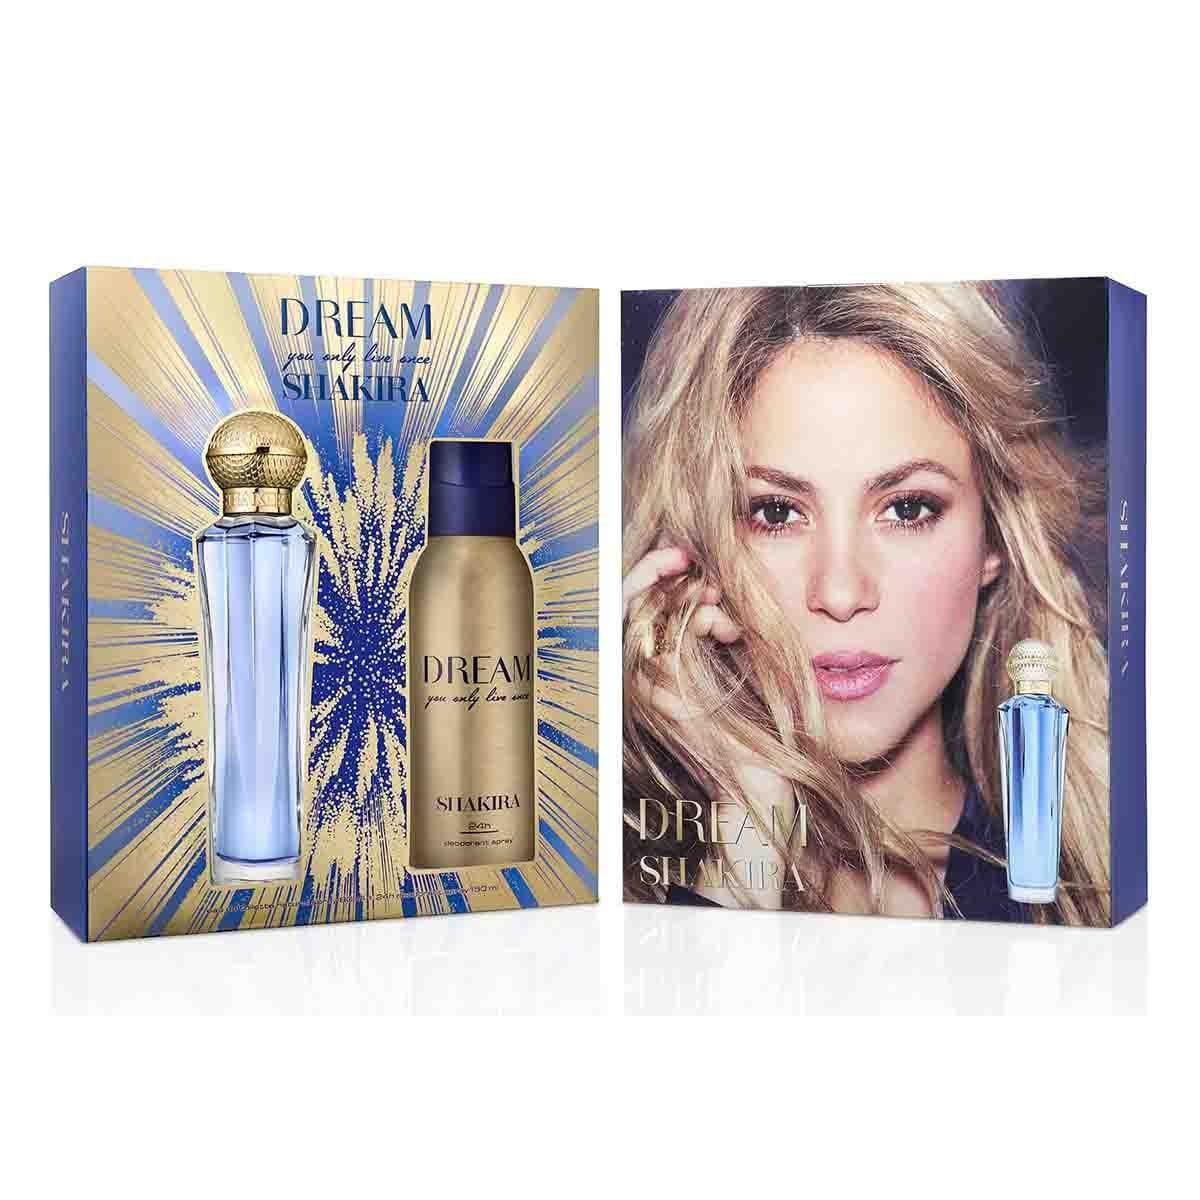 Estuche para Dama Shakira Dream Edt 80 Ml + Desodorante 150 Ml